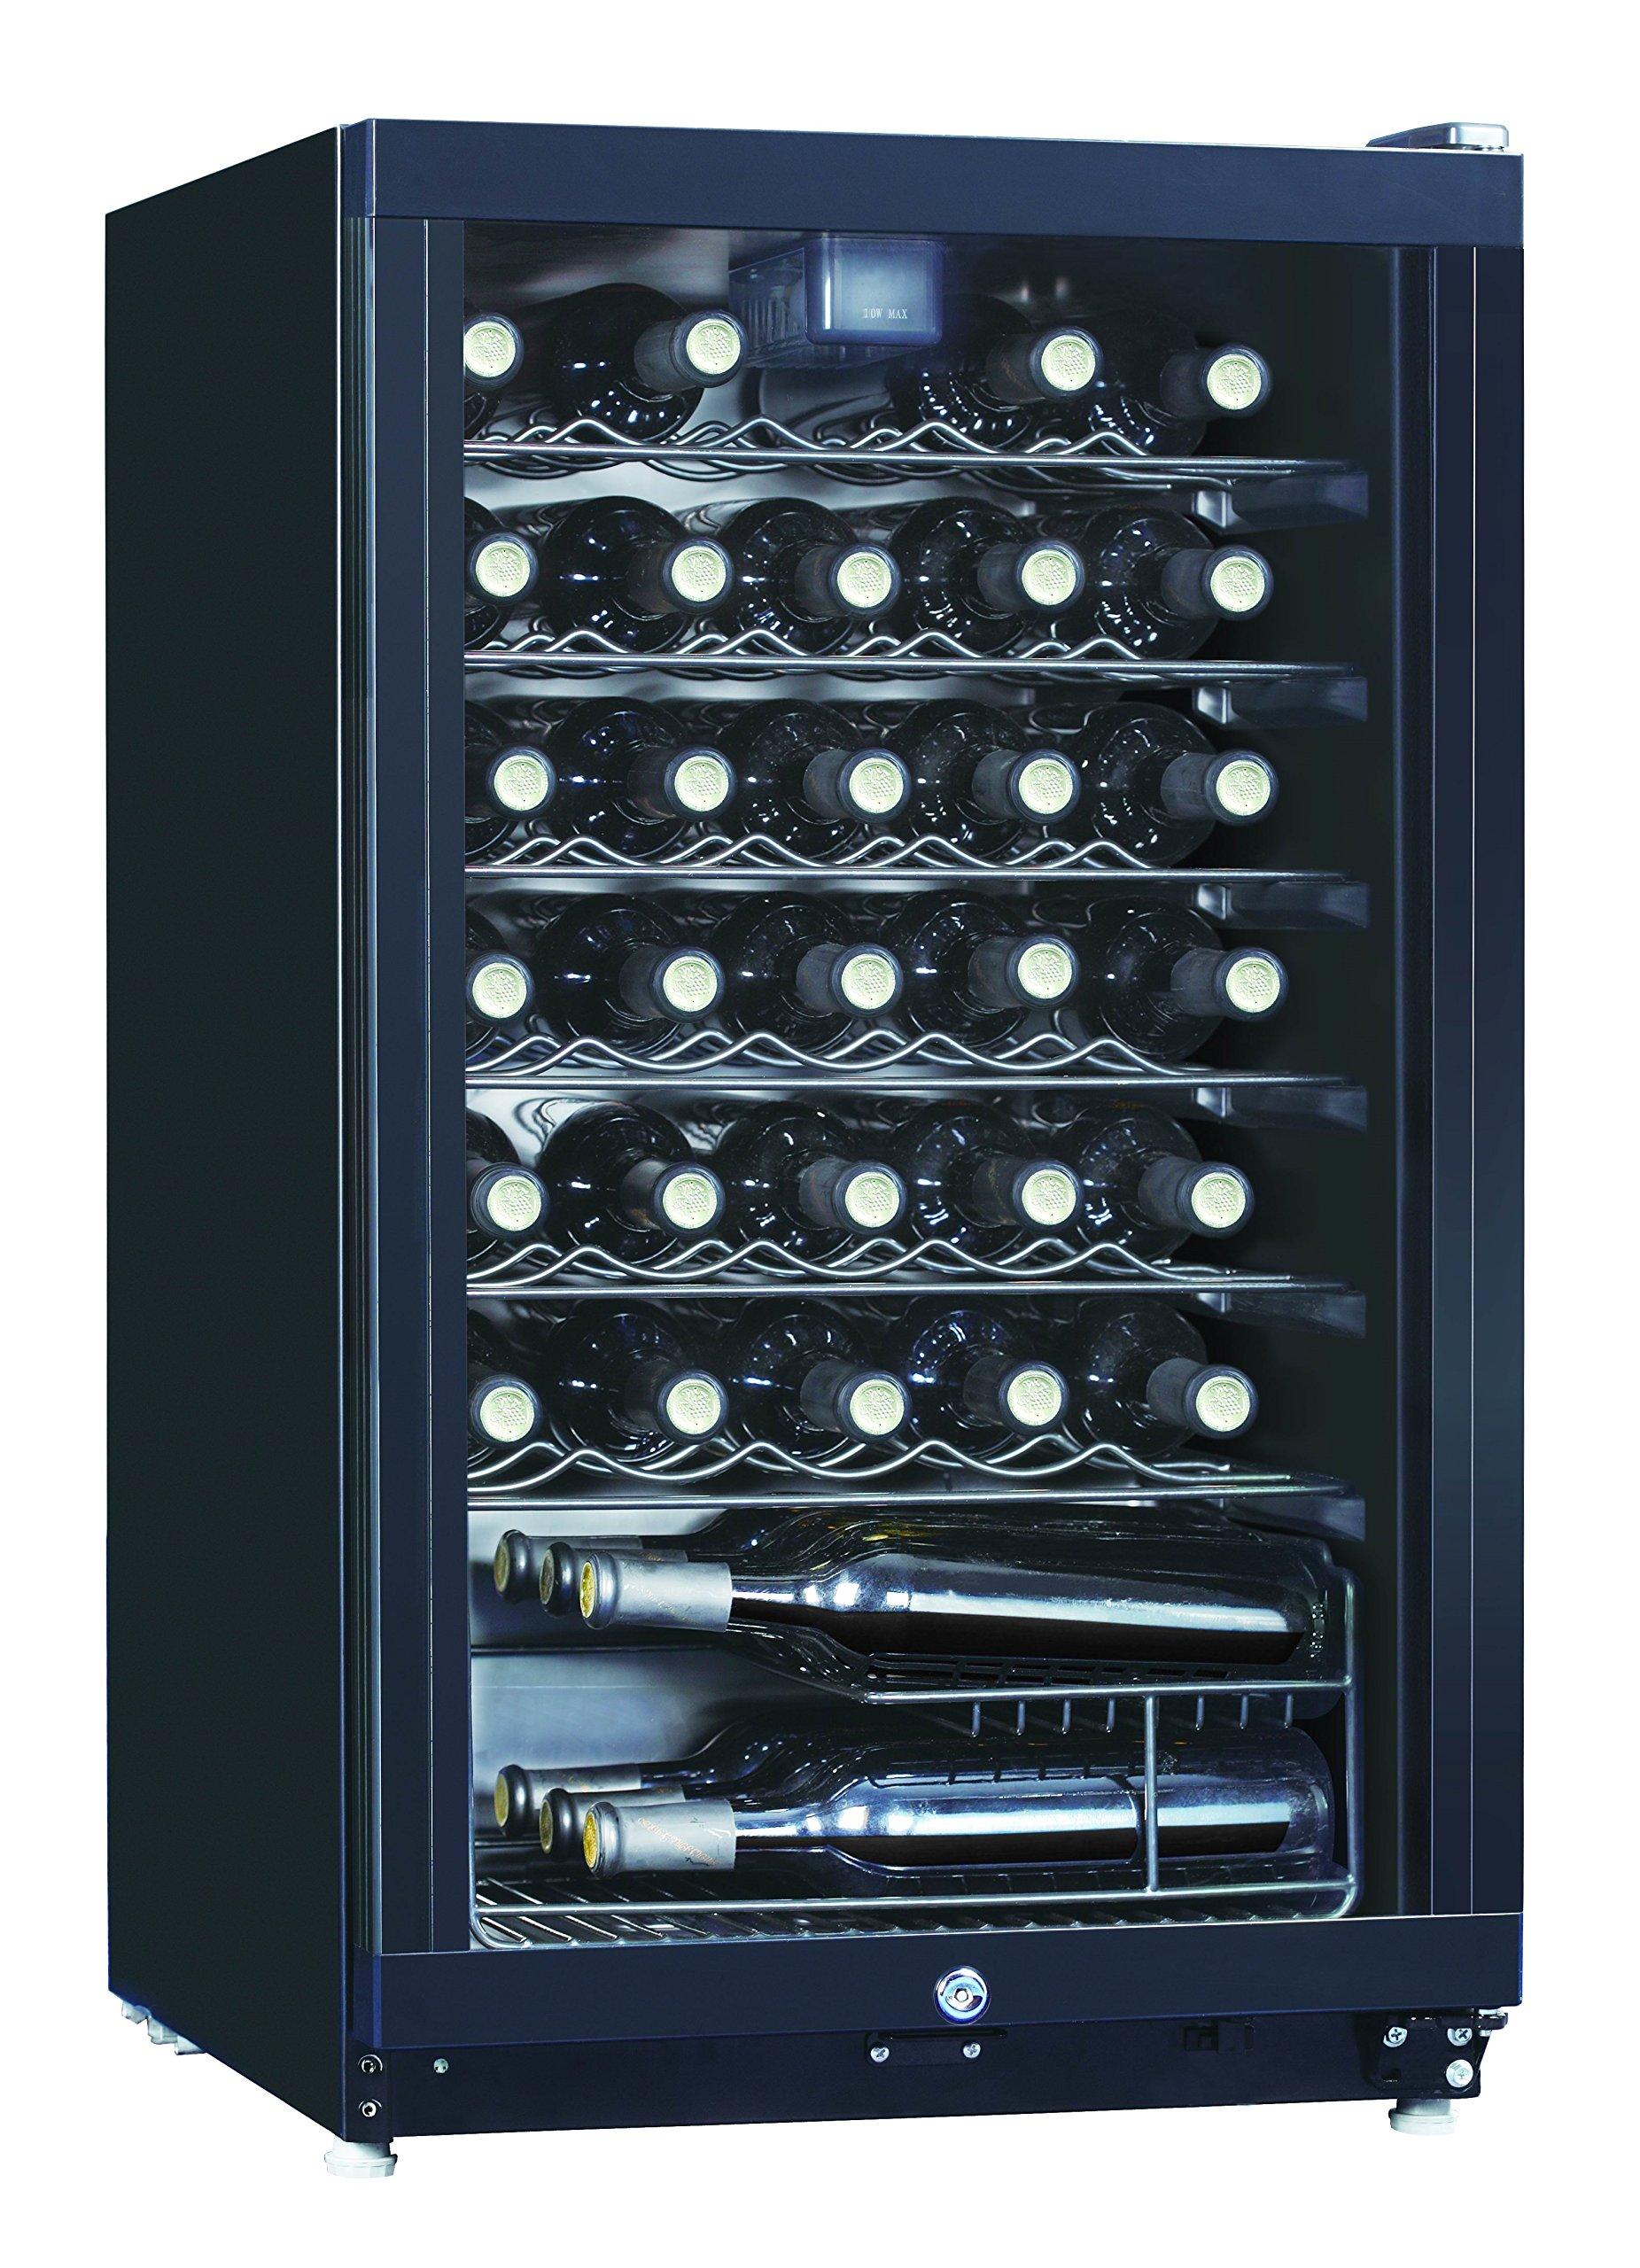 Midea WHS-144W1 35-Bottle Free Standing Wine Cooler Refrigerator, Black